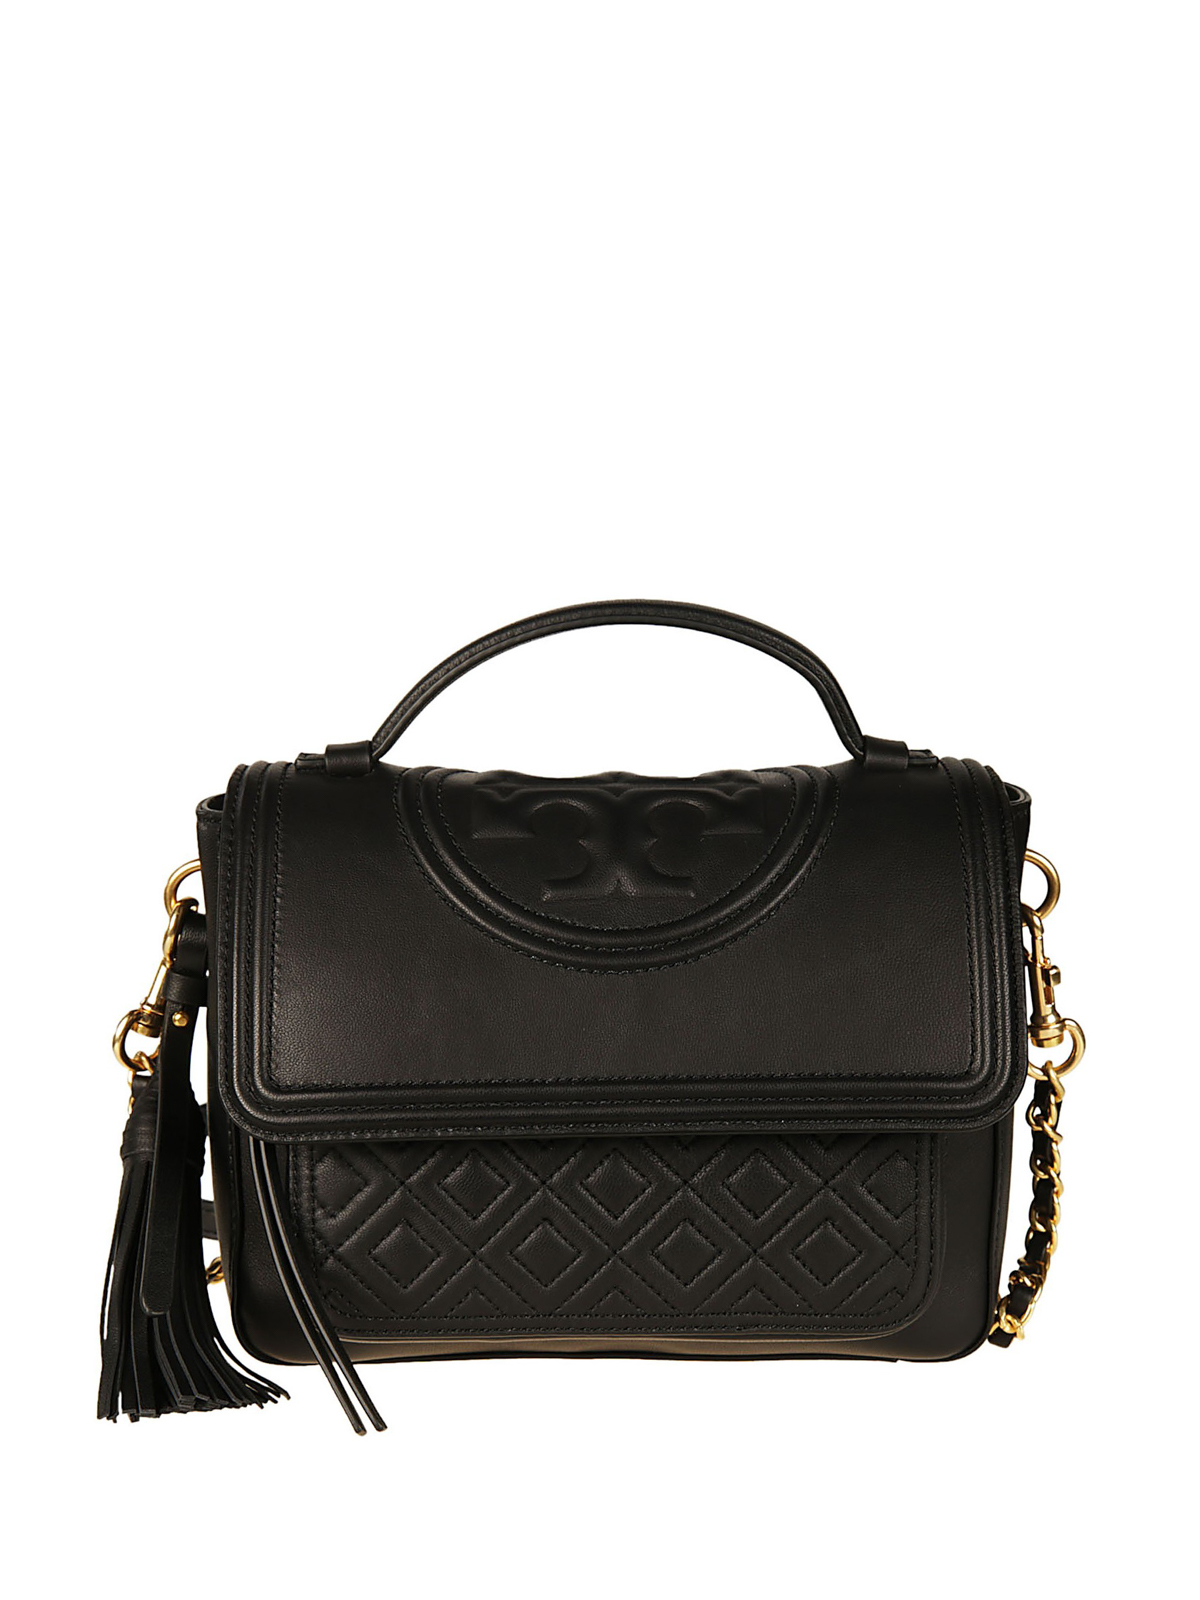 ec554b134688 Tory Burch - Fleming black leather satchel - bowling bags - 45147 001